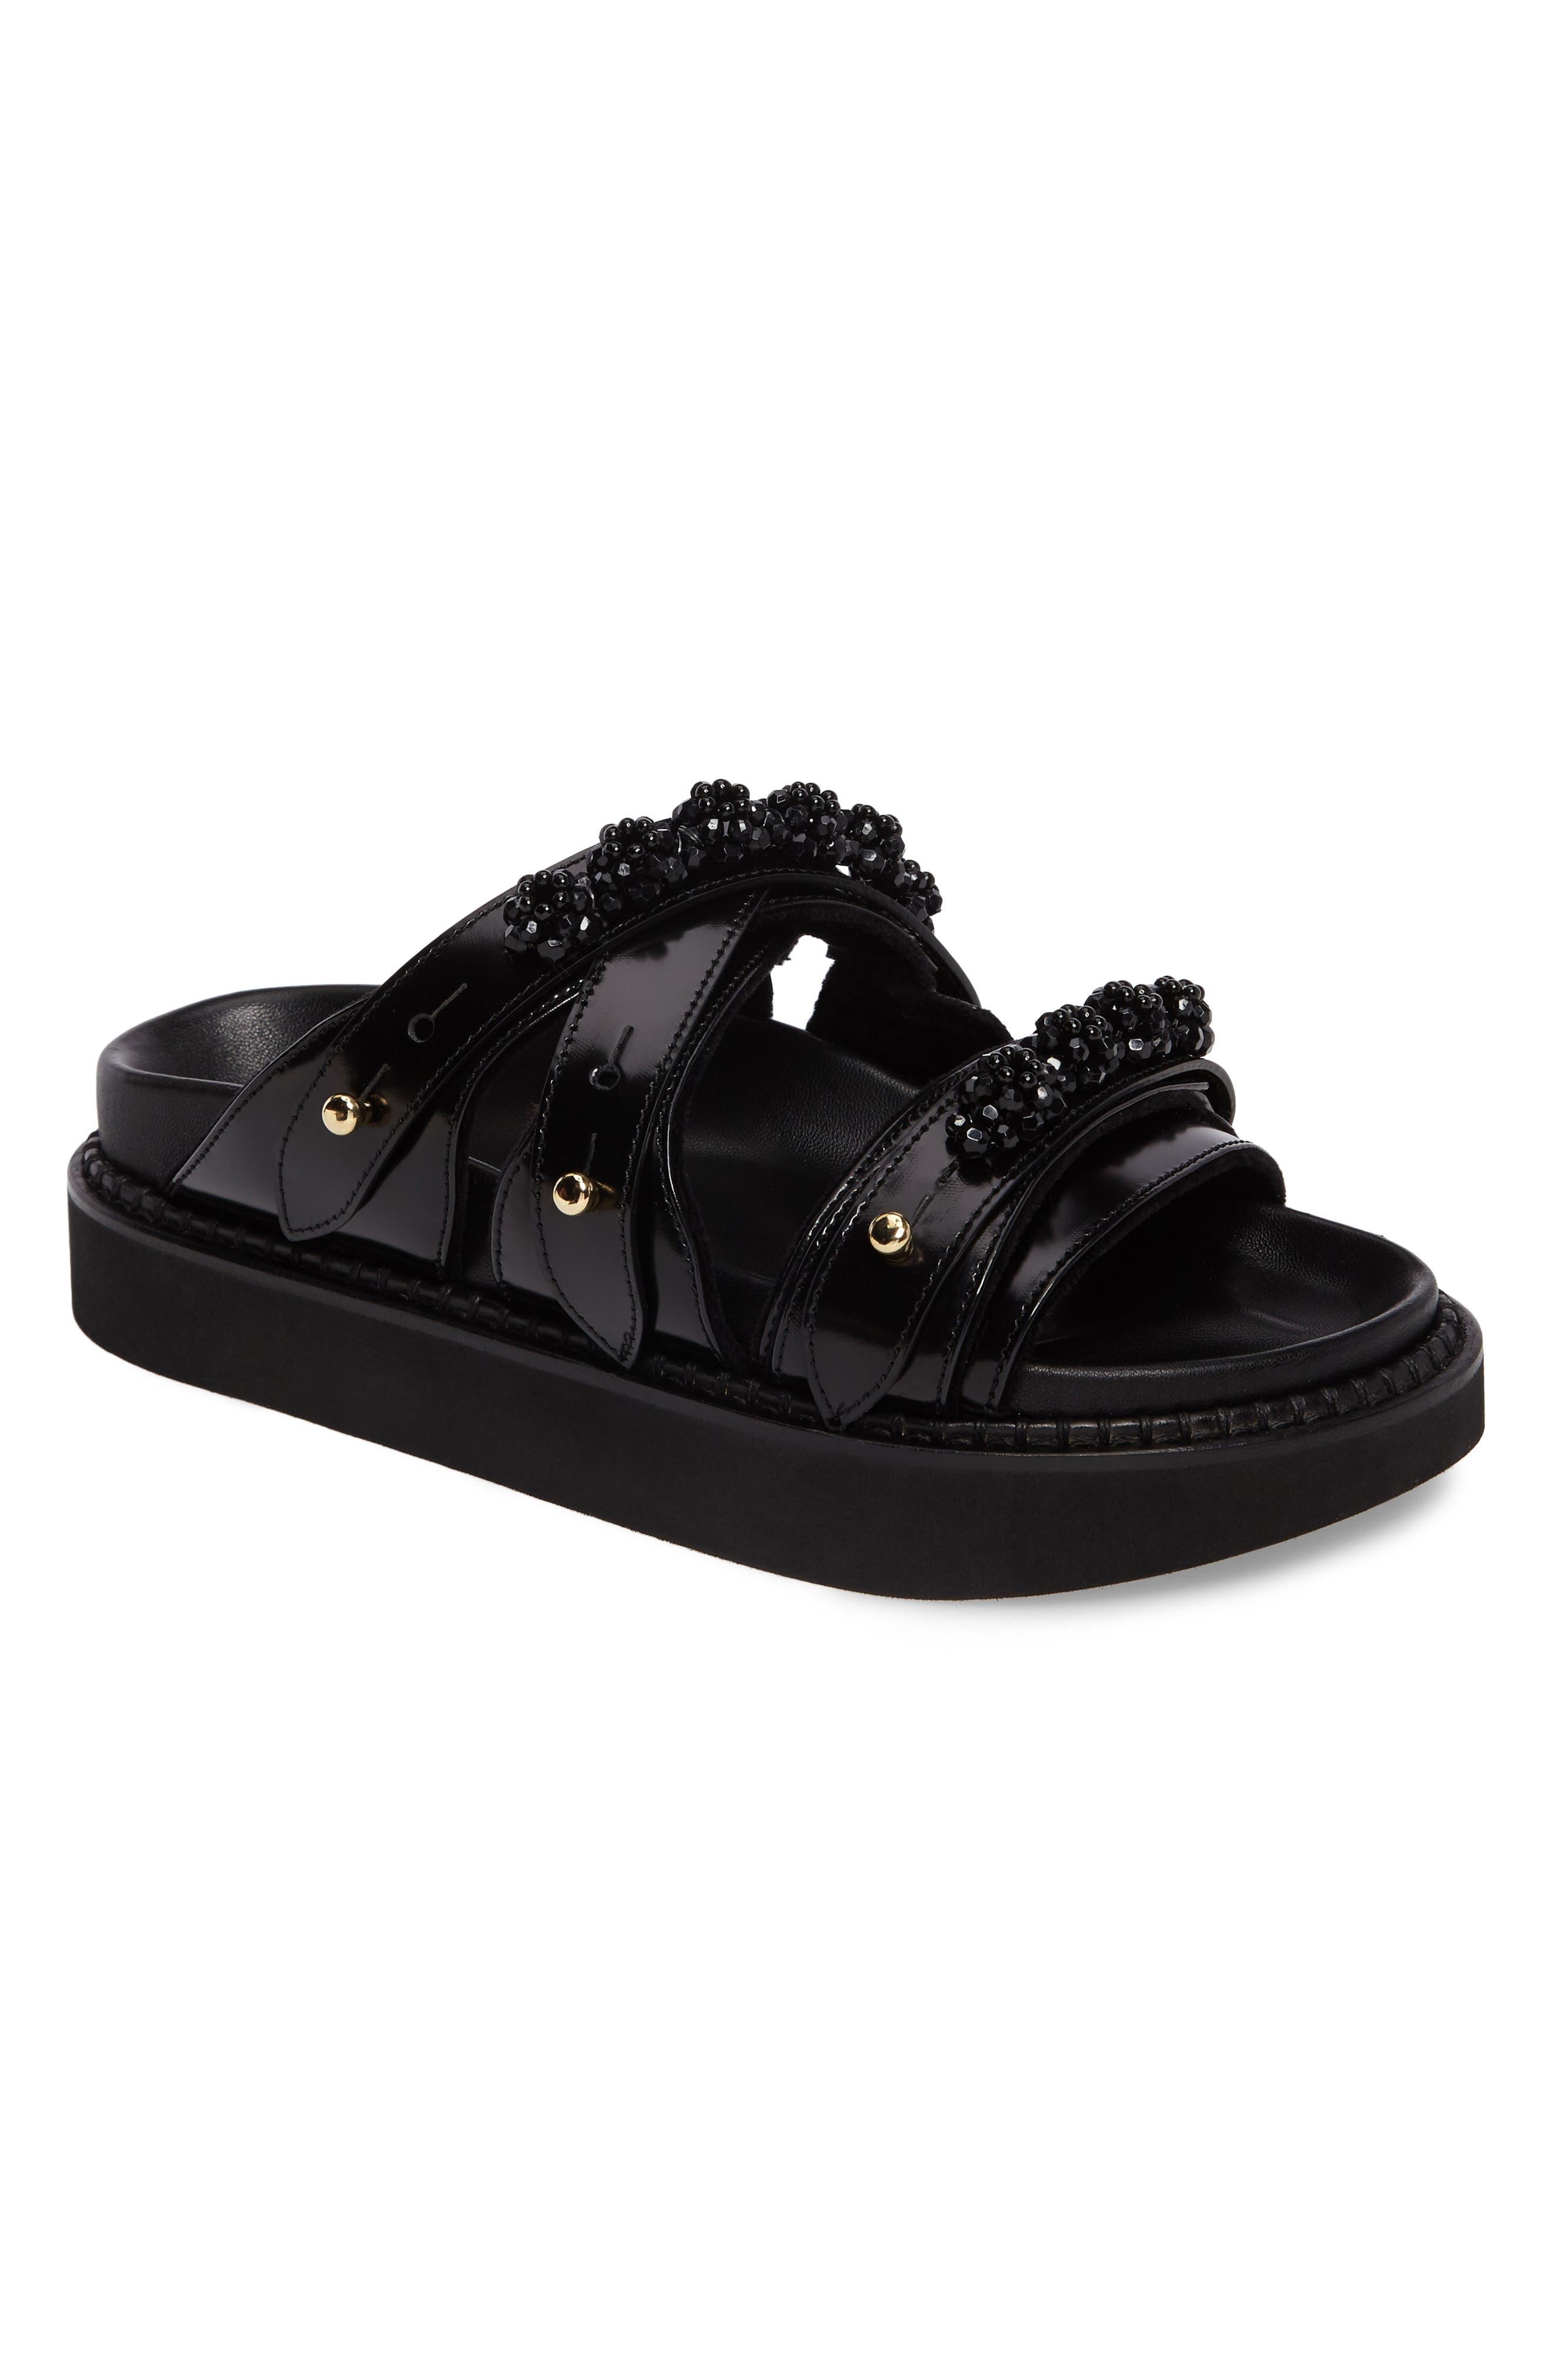 Beaded Leather Slide Sandal,                             Main thumbnail 1, color,                             Black